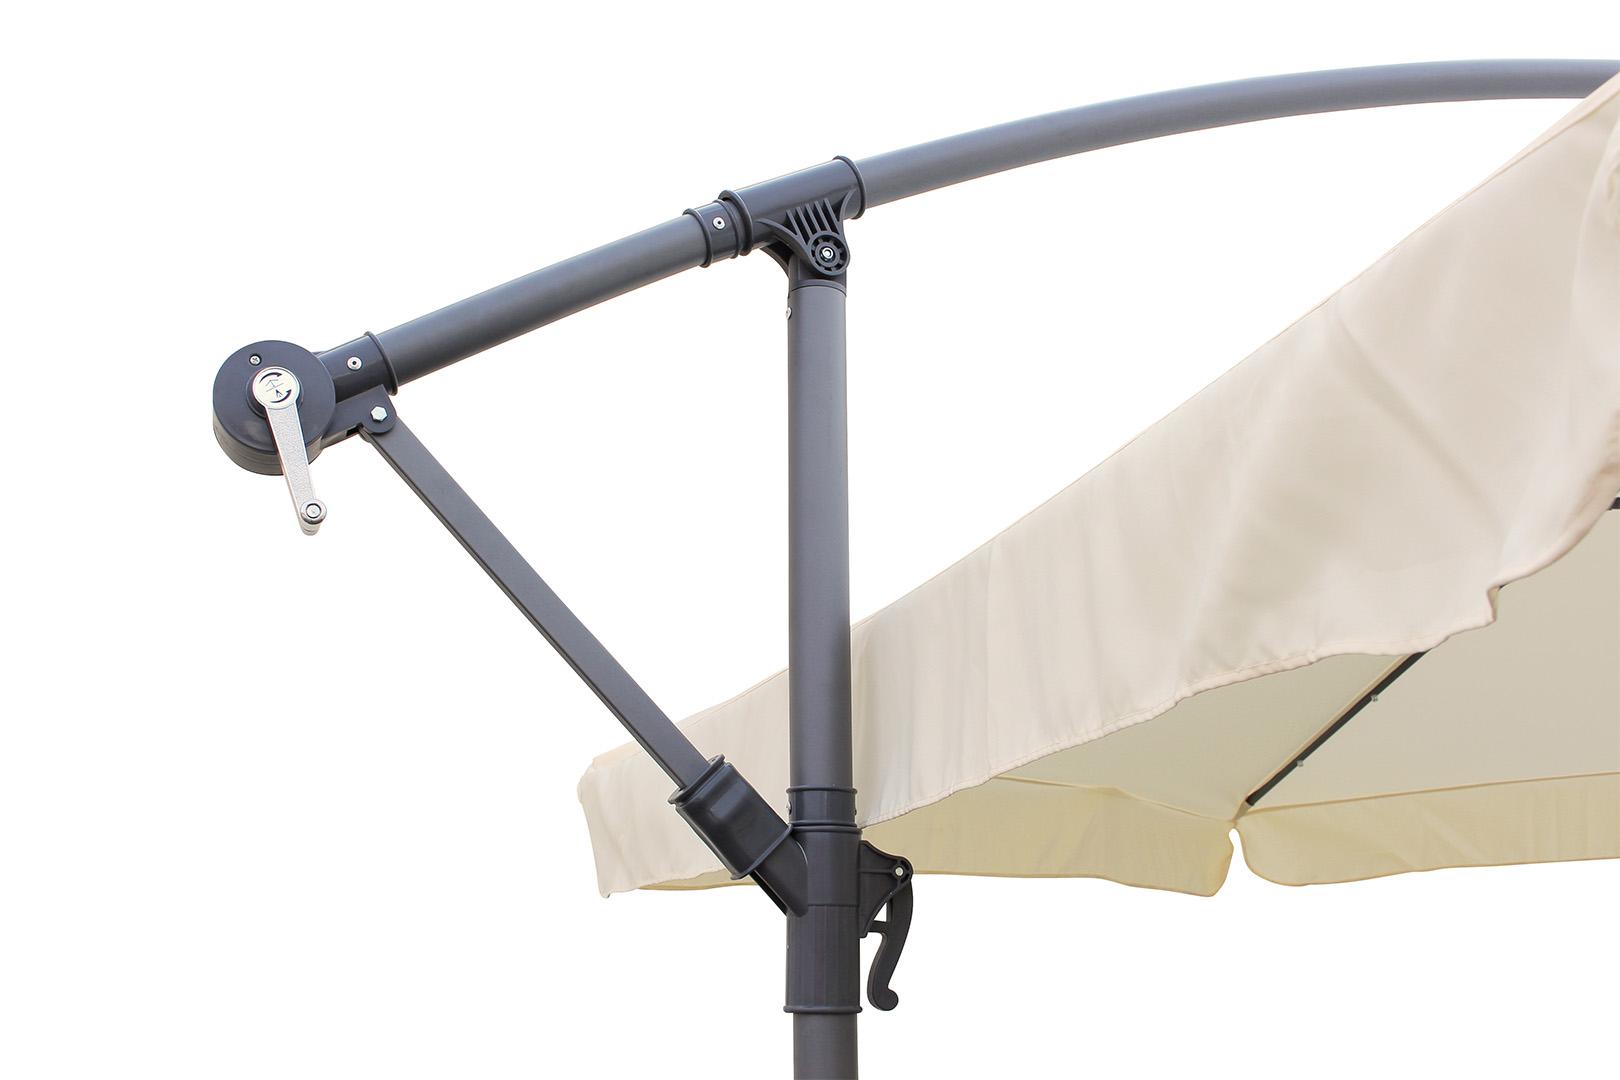 quadfactory bottrop miweba ampelschirm sunny volant led 350 cm mit schutzh lle. Black Bedroom Furniture Sets. Home Design Ideas